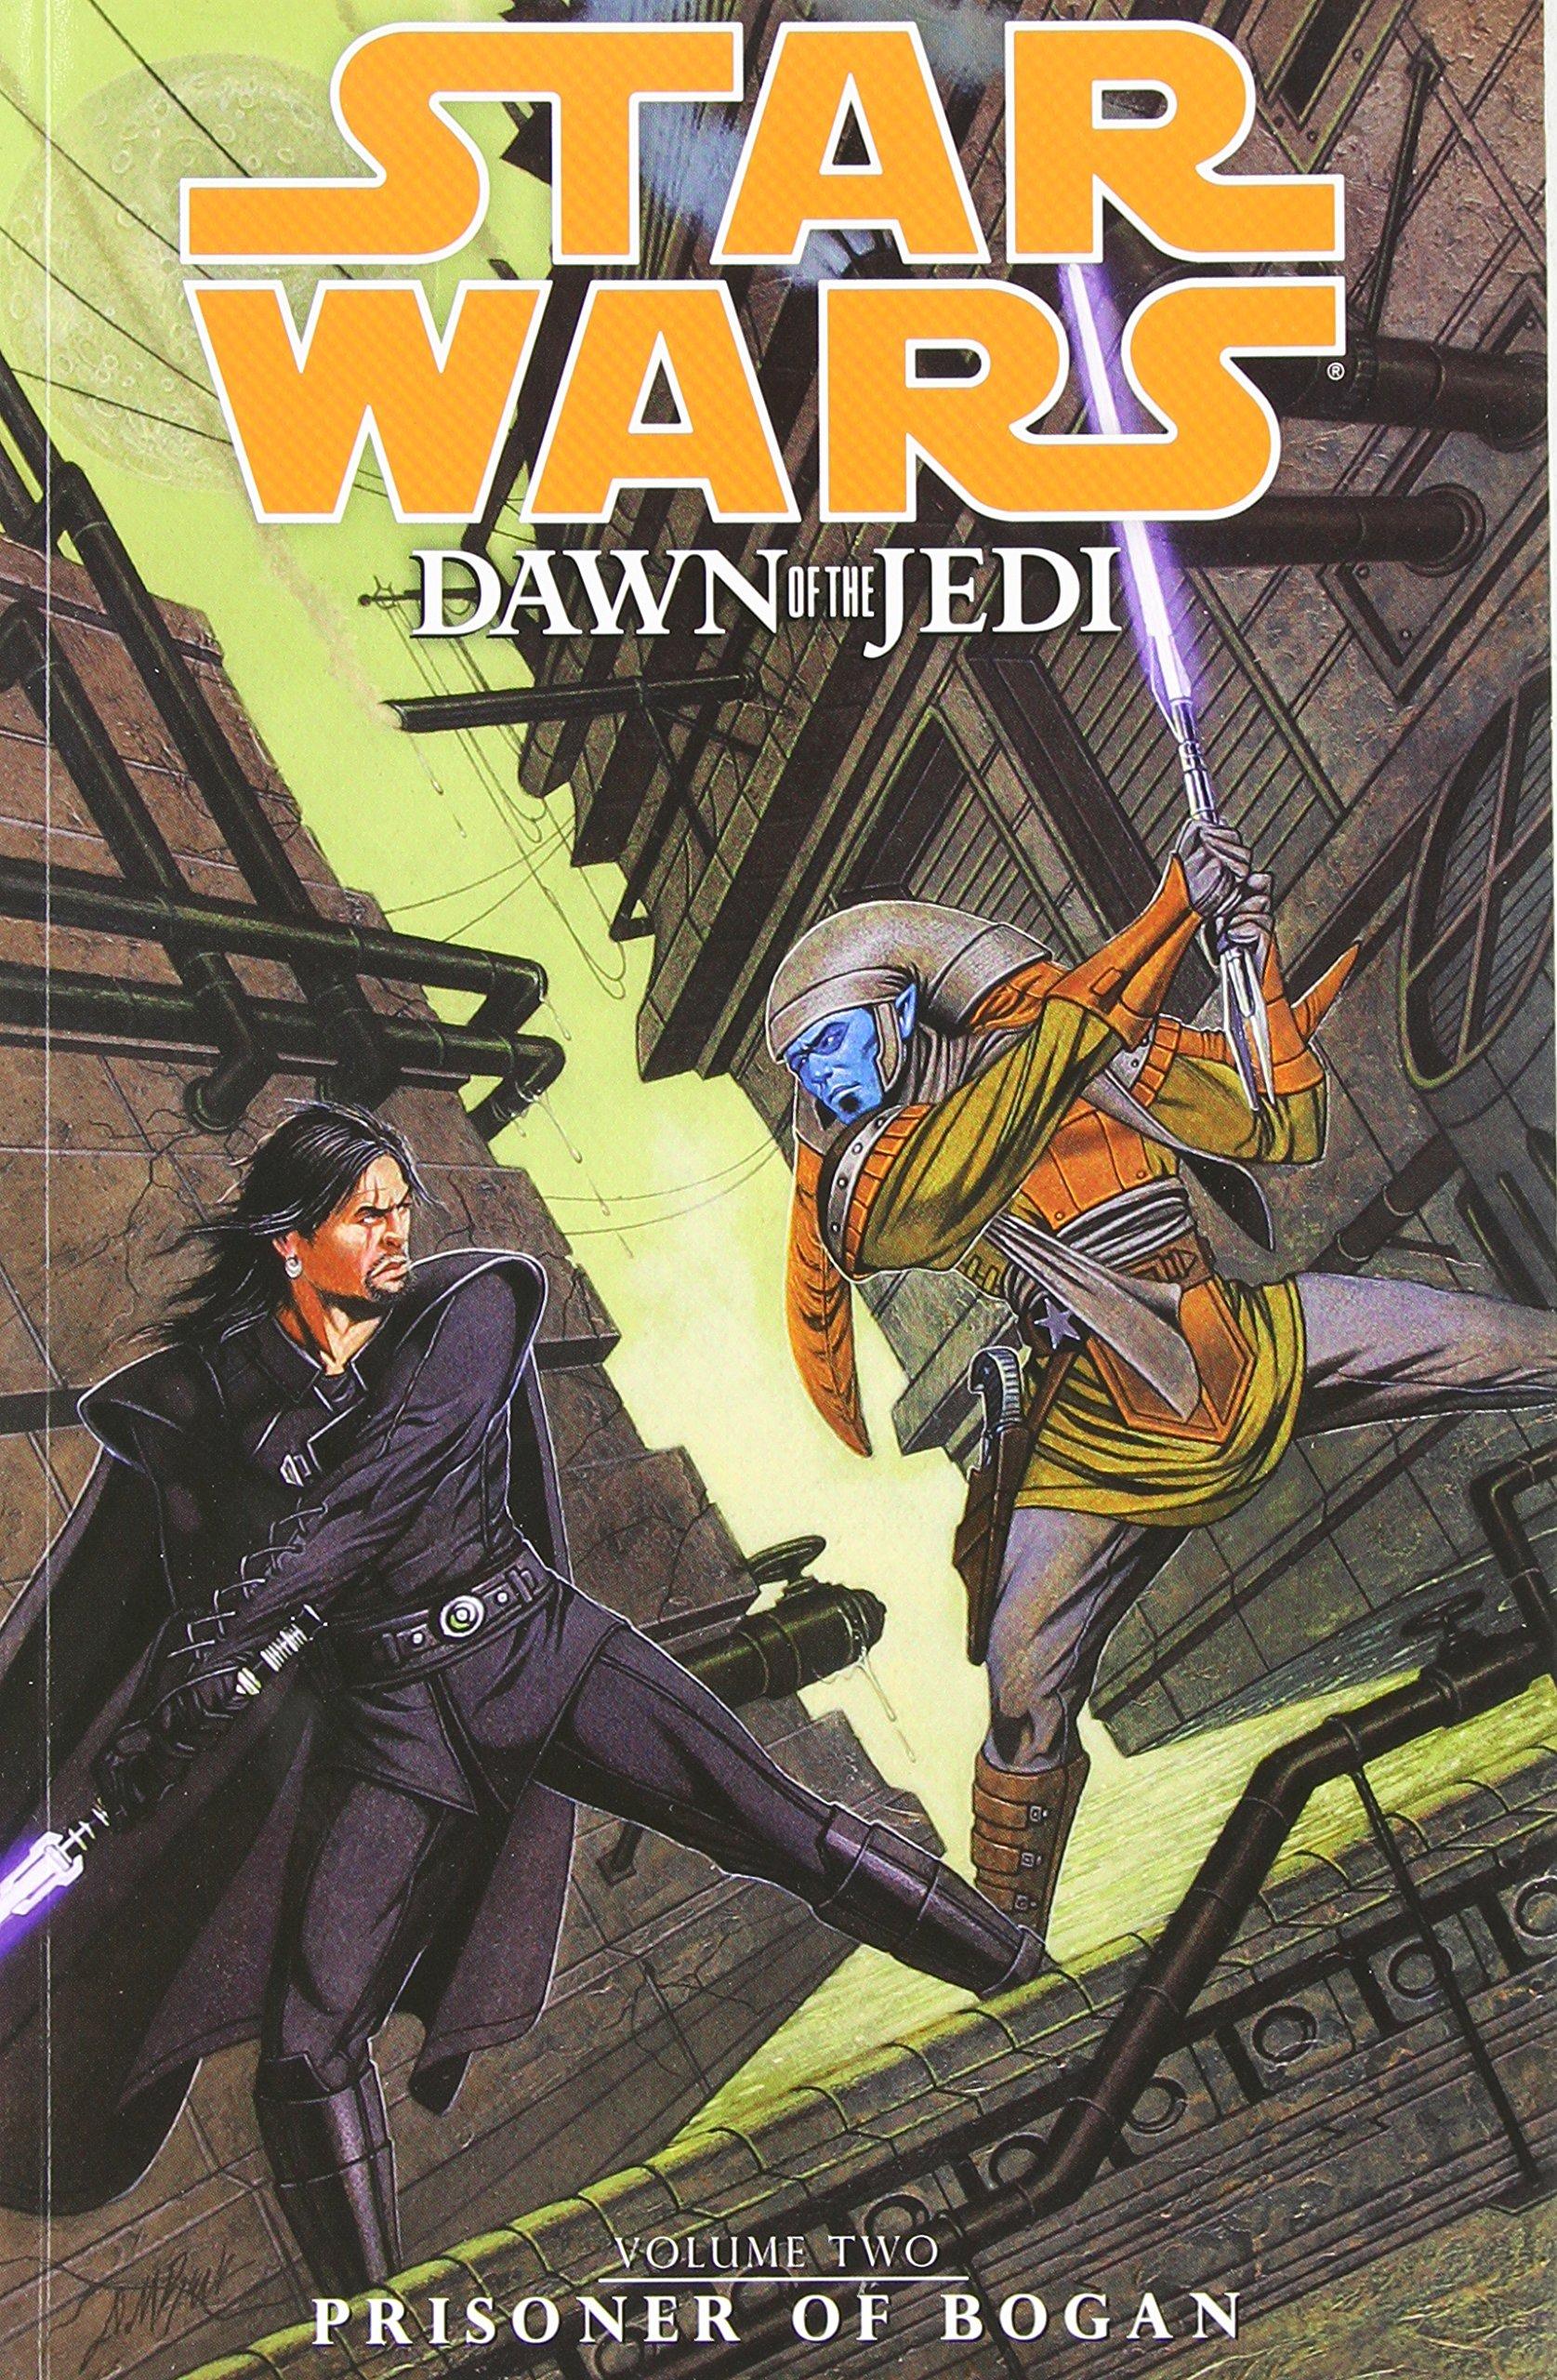 Star Wars: Dawn Of The Jedi Volume 2  Prisoner Of Bogan (star Wars: Dawn  Of The Jedi (numbered)): John Ostrander, Randy Stradley, Jan Duursema,